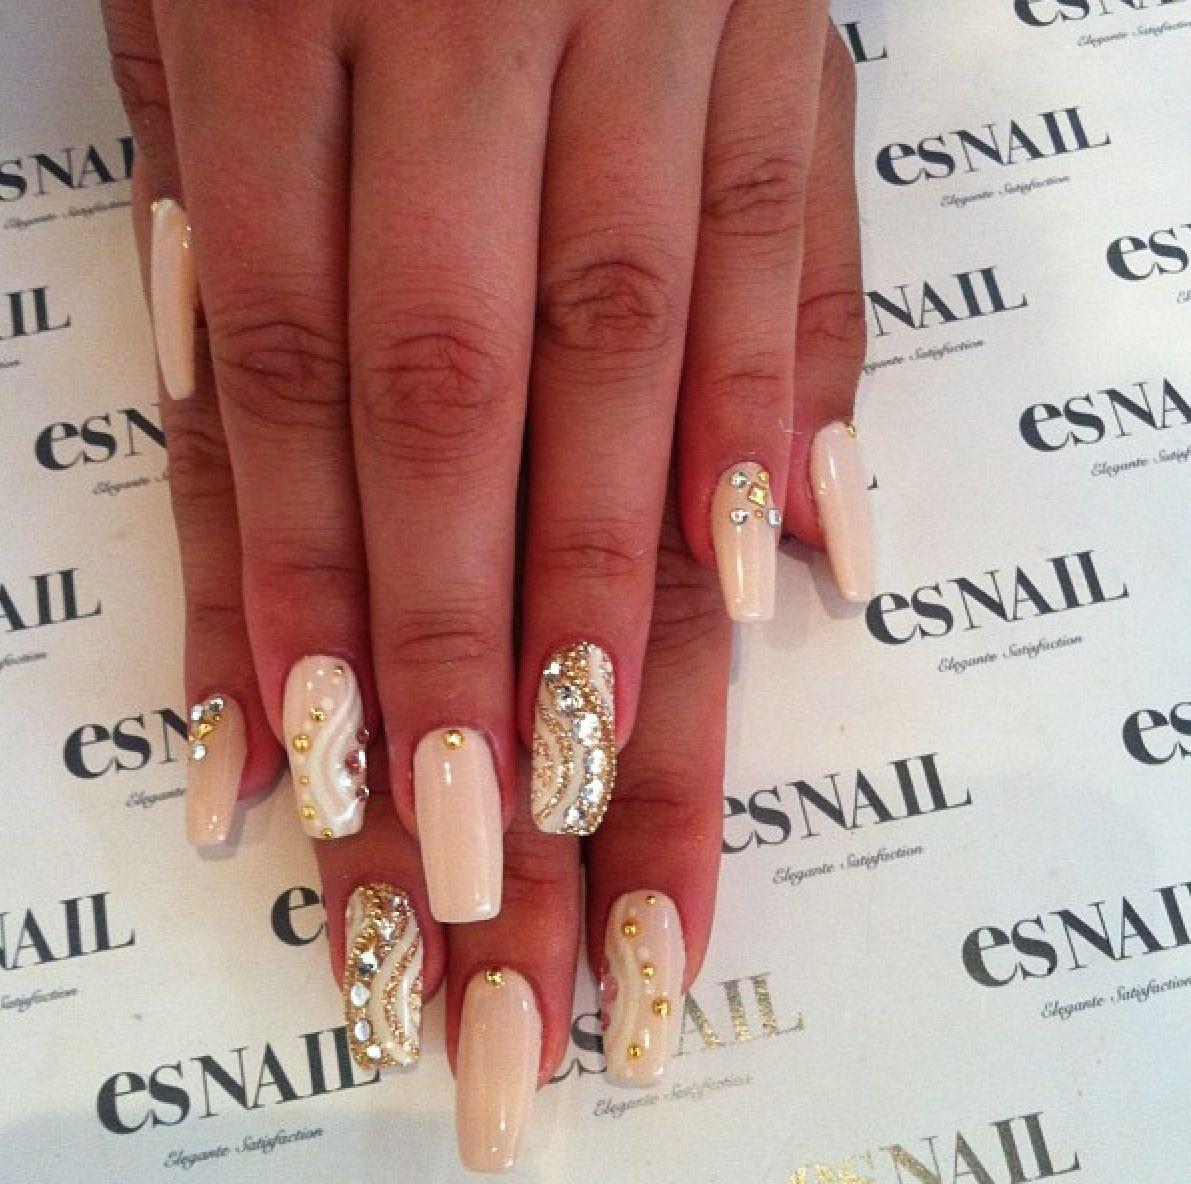 Nude jeweled acrylic nails | Nails | Pinterest